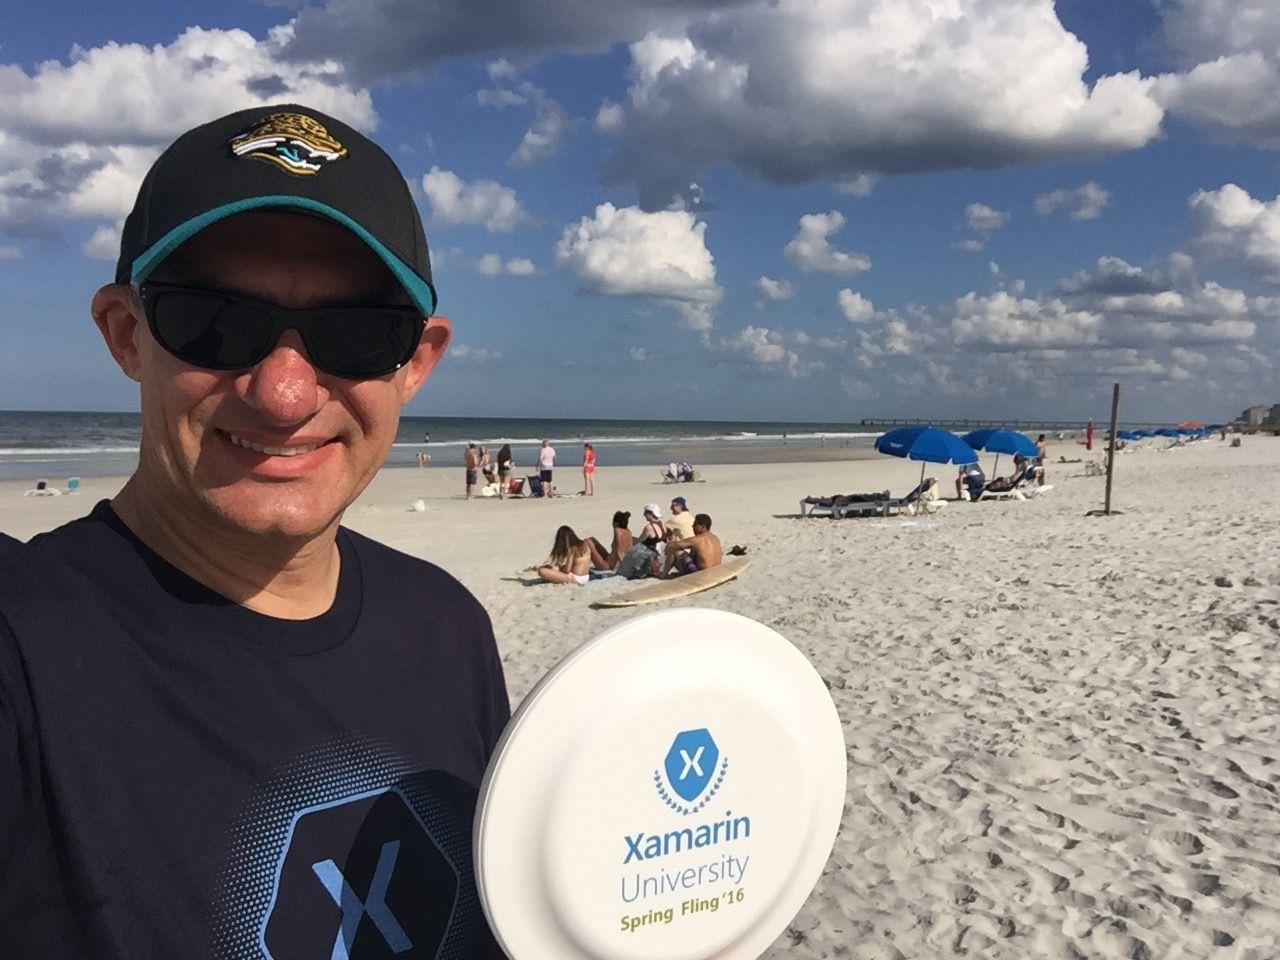 North Florida Xamarin User Group